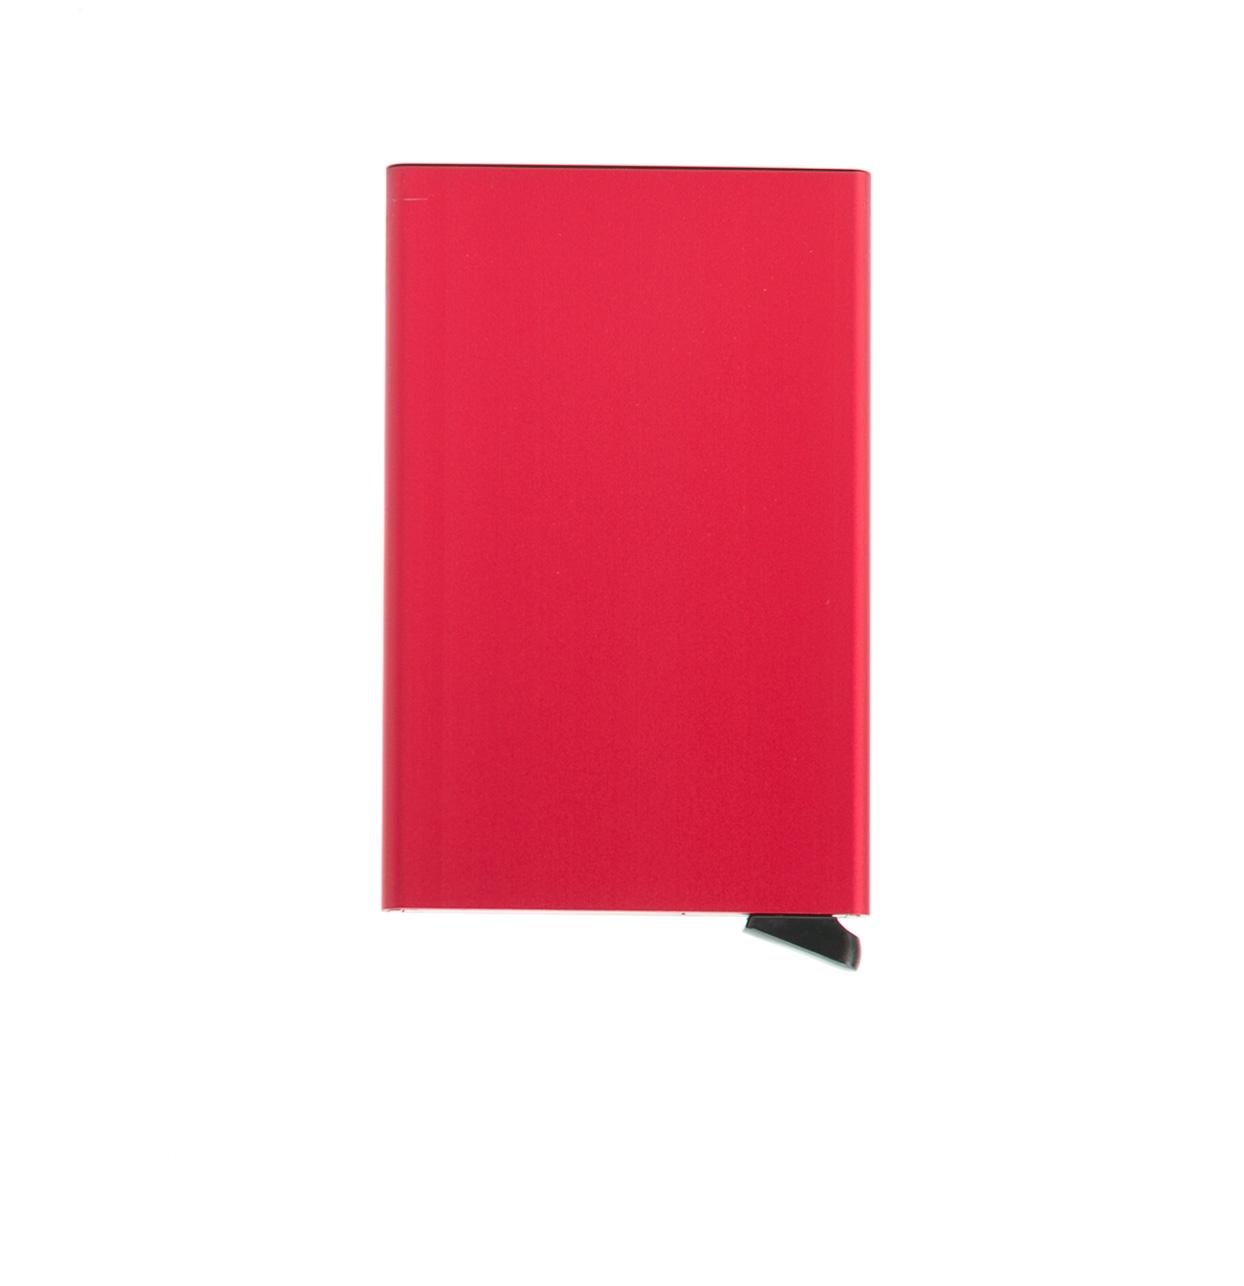 Secrid slim wallet con cardprotector de aluminio ultrafino, color rojo.